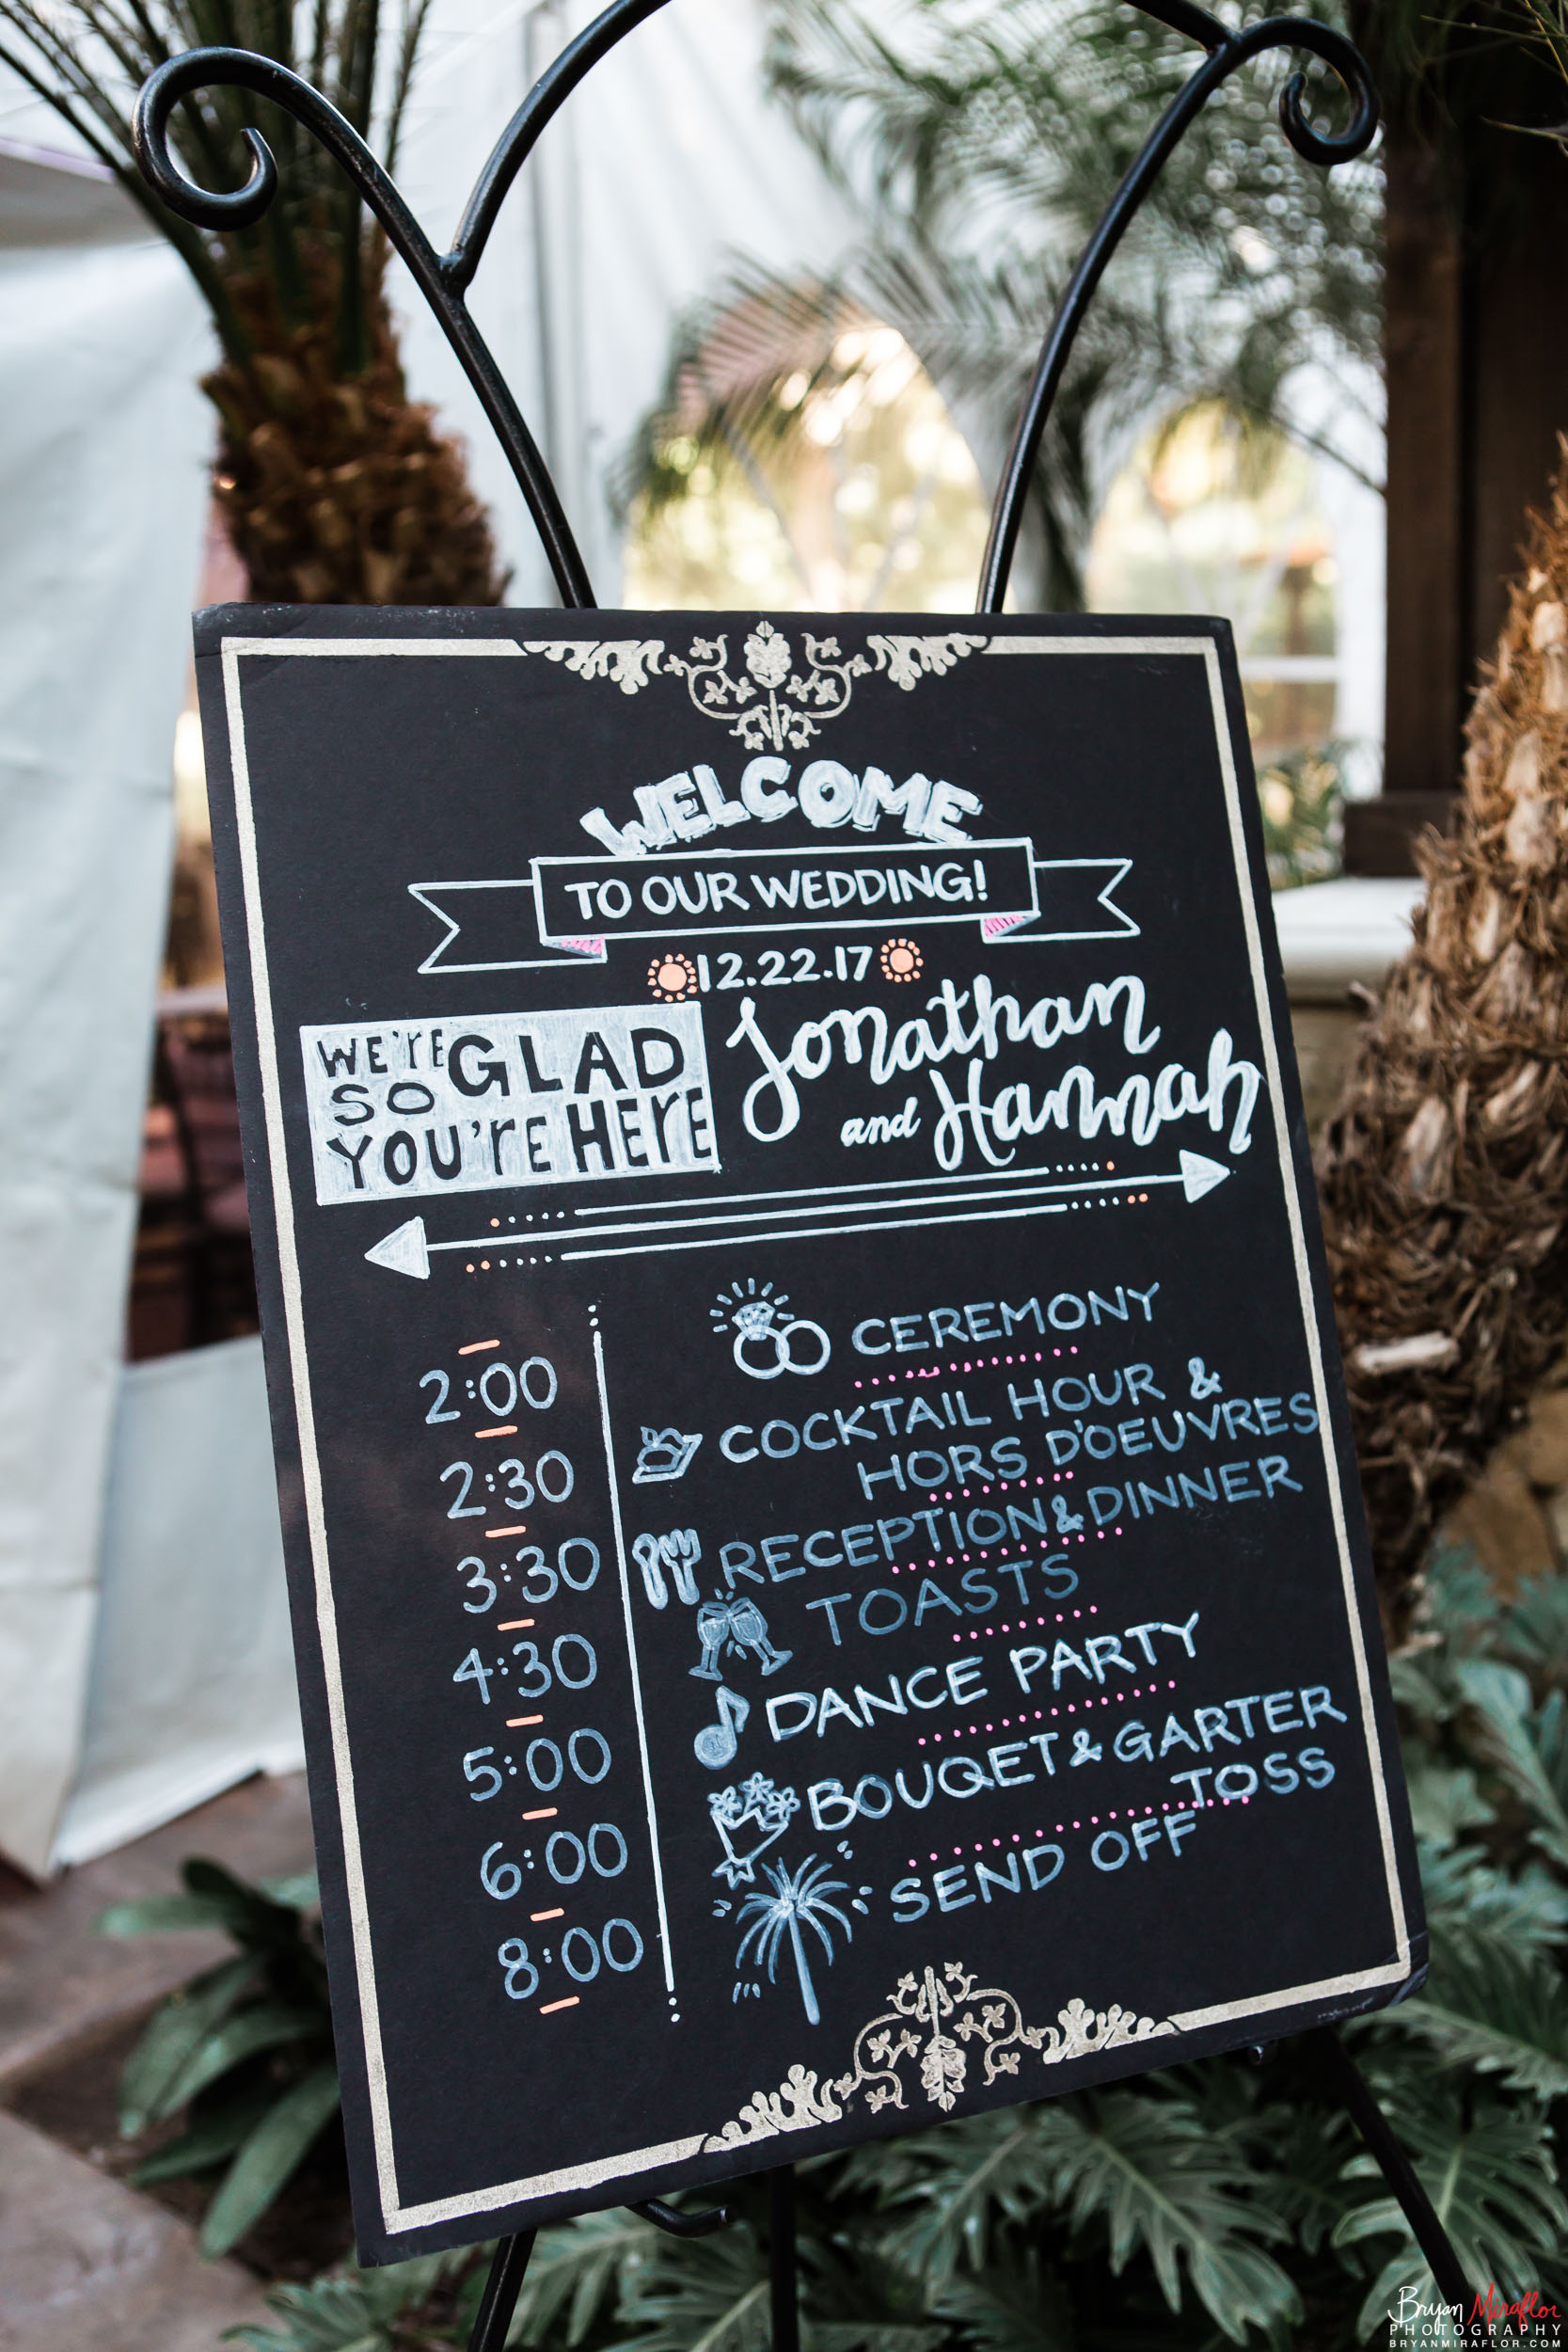 Bryan-Miraflor-Photography-Hannah-Jonathan-Married-Grand-Traditions-Estate-Gardens-Fallbrook-20171222-151.jpg